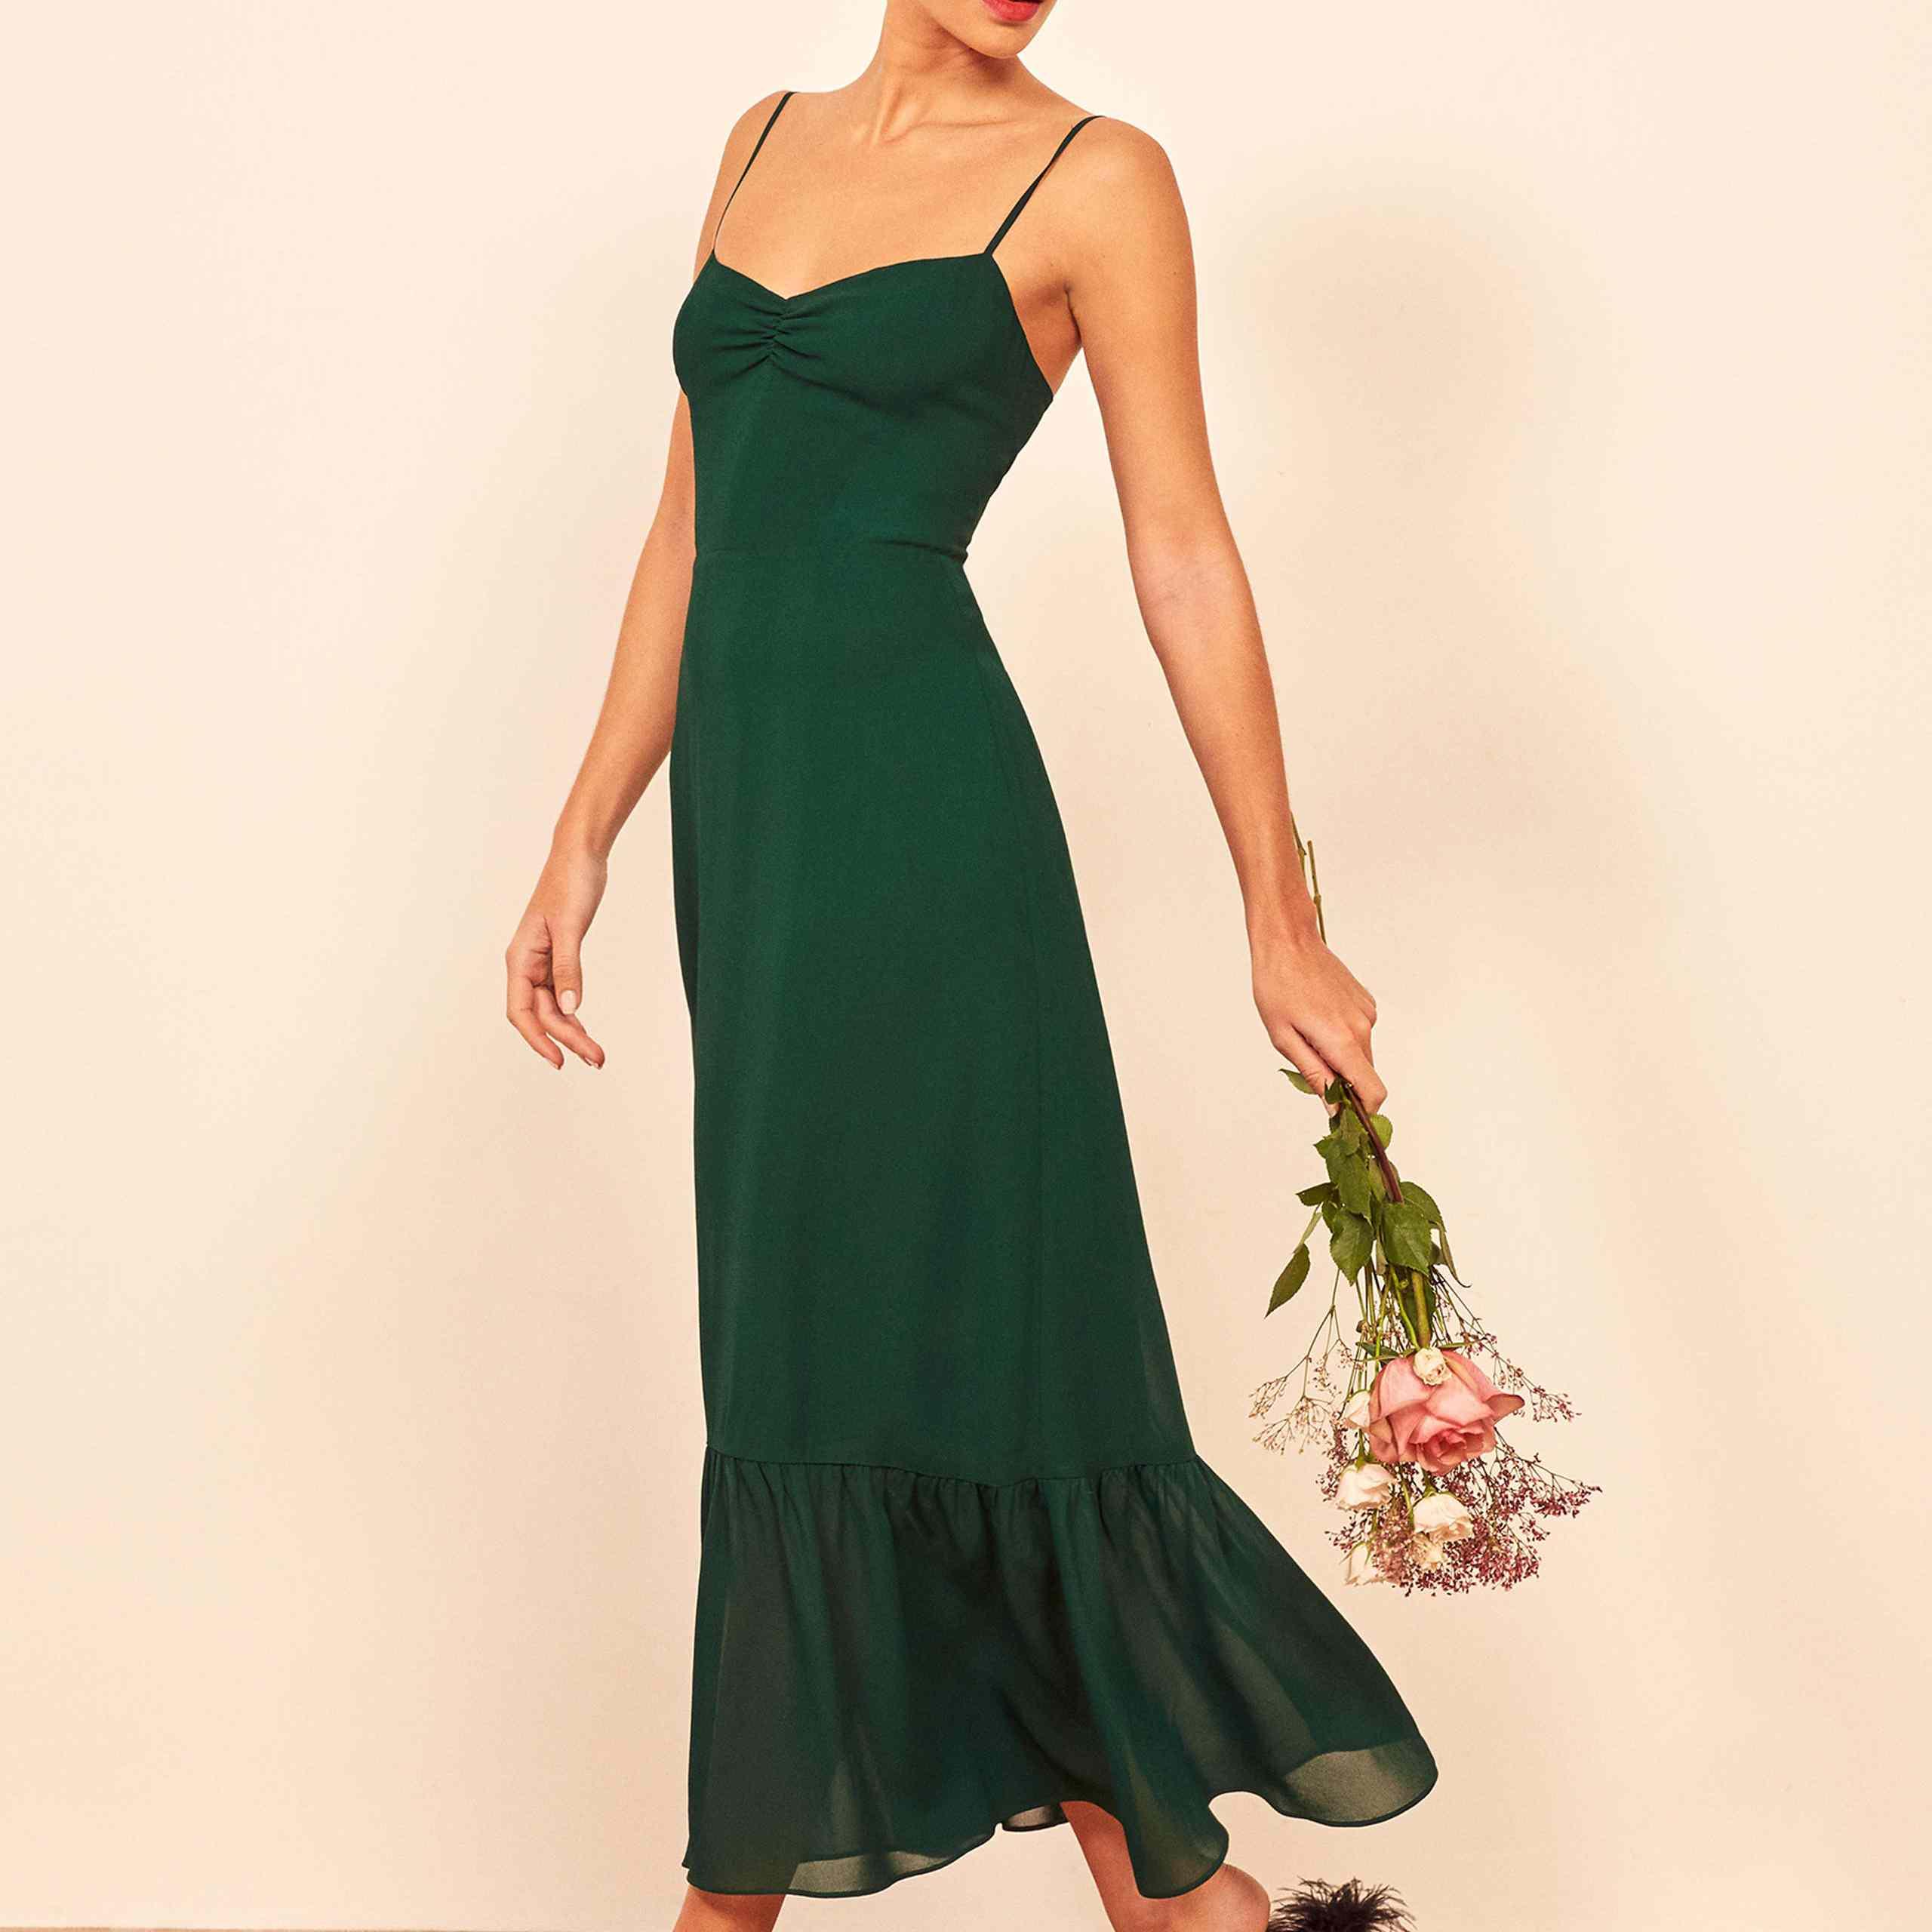 20 Best Green Bridesmaid Dresses of 20